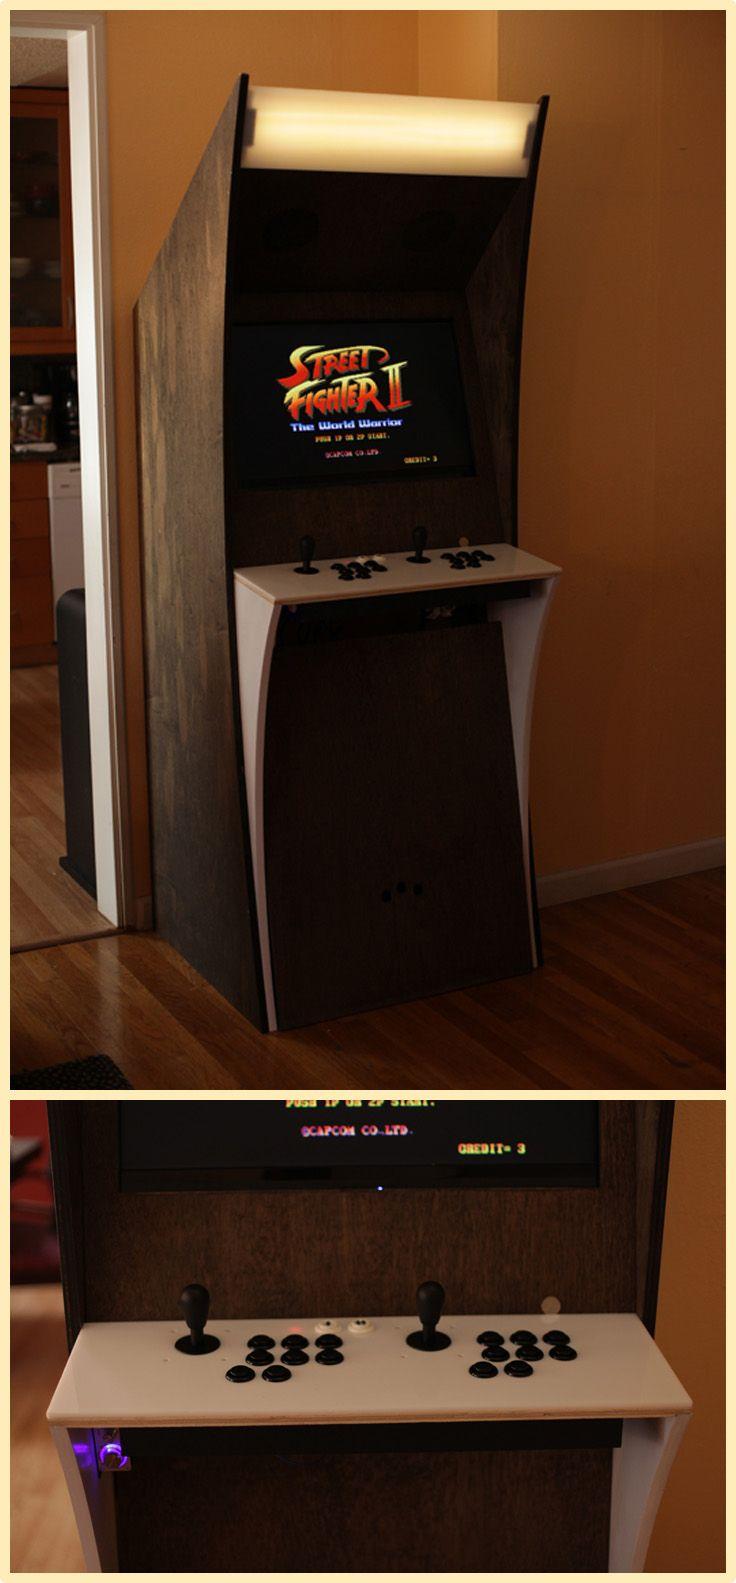 Stylish Custom Arcade Cabinet via Reddit user Scalarr